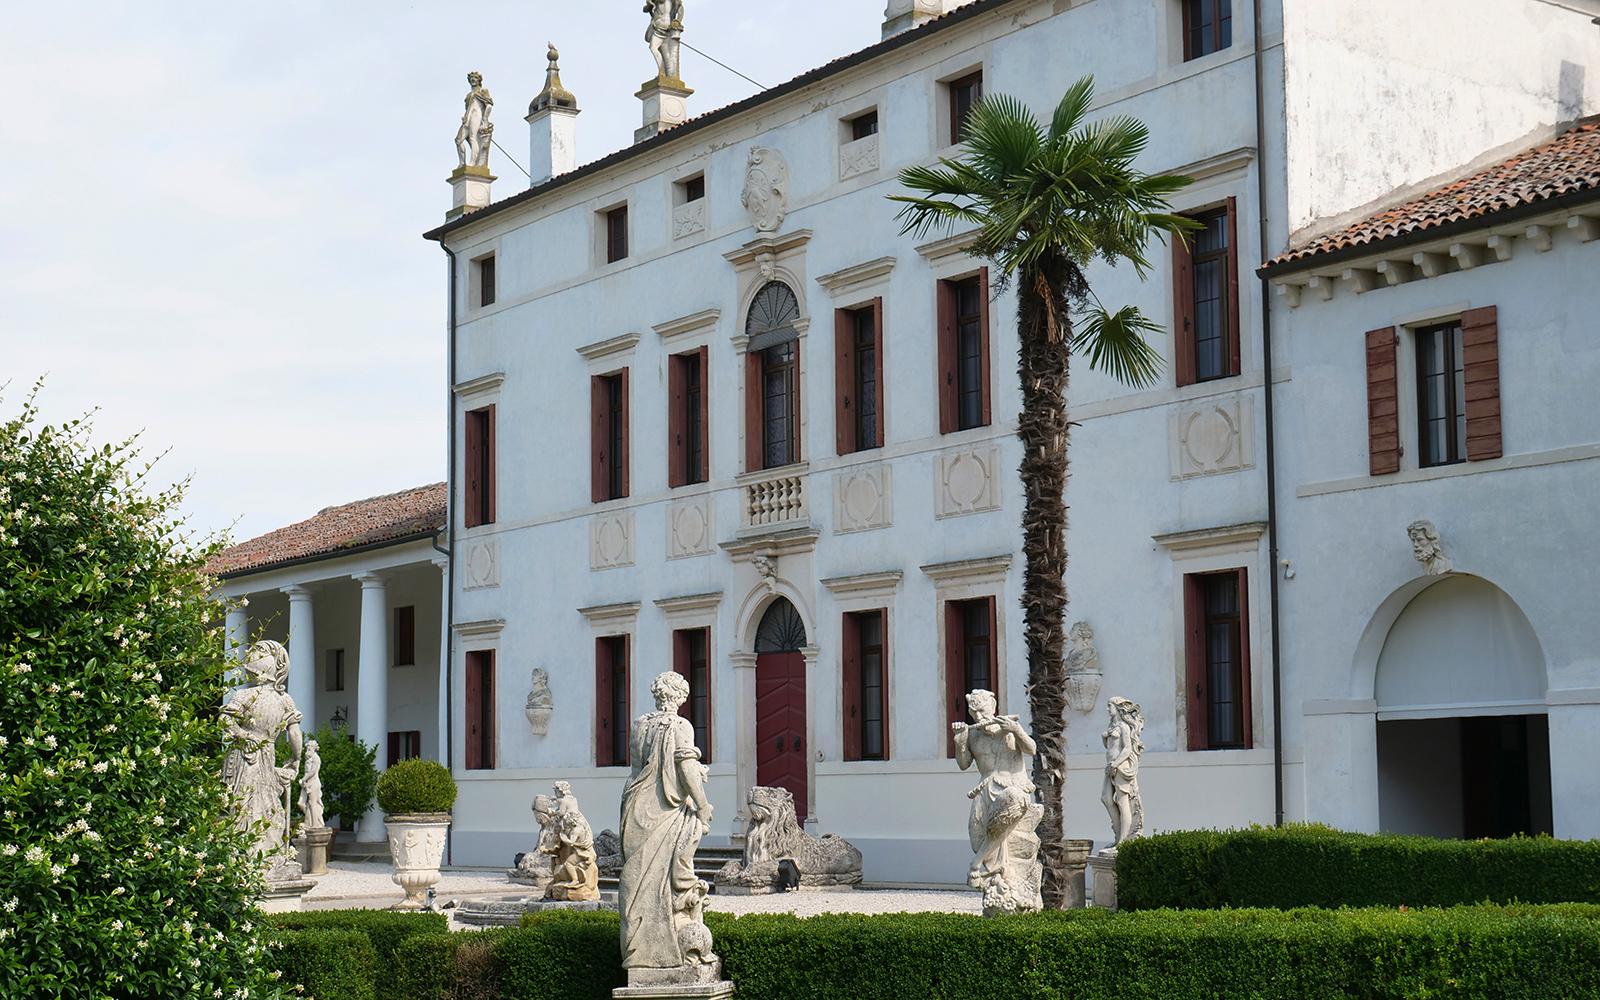 Vicenza ricevimento matrimonio Vicenza matrimonio ricevimento , villa per eventi, villa per eventi Vicenza, villa per eventi Padova , villa per matrimoni Vicenza, villa per matrimoni Padova